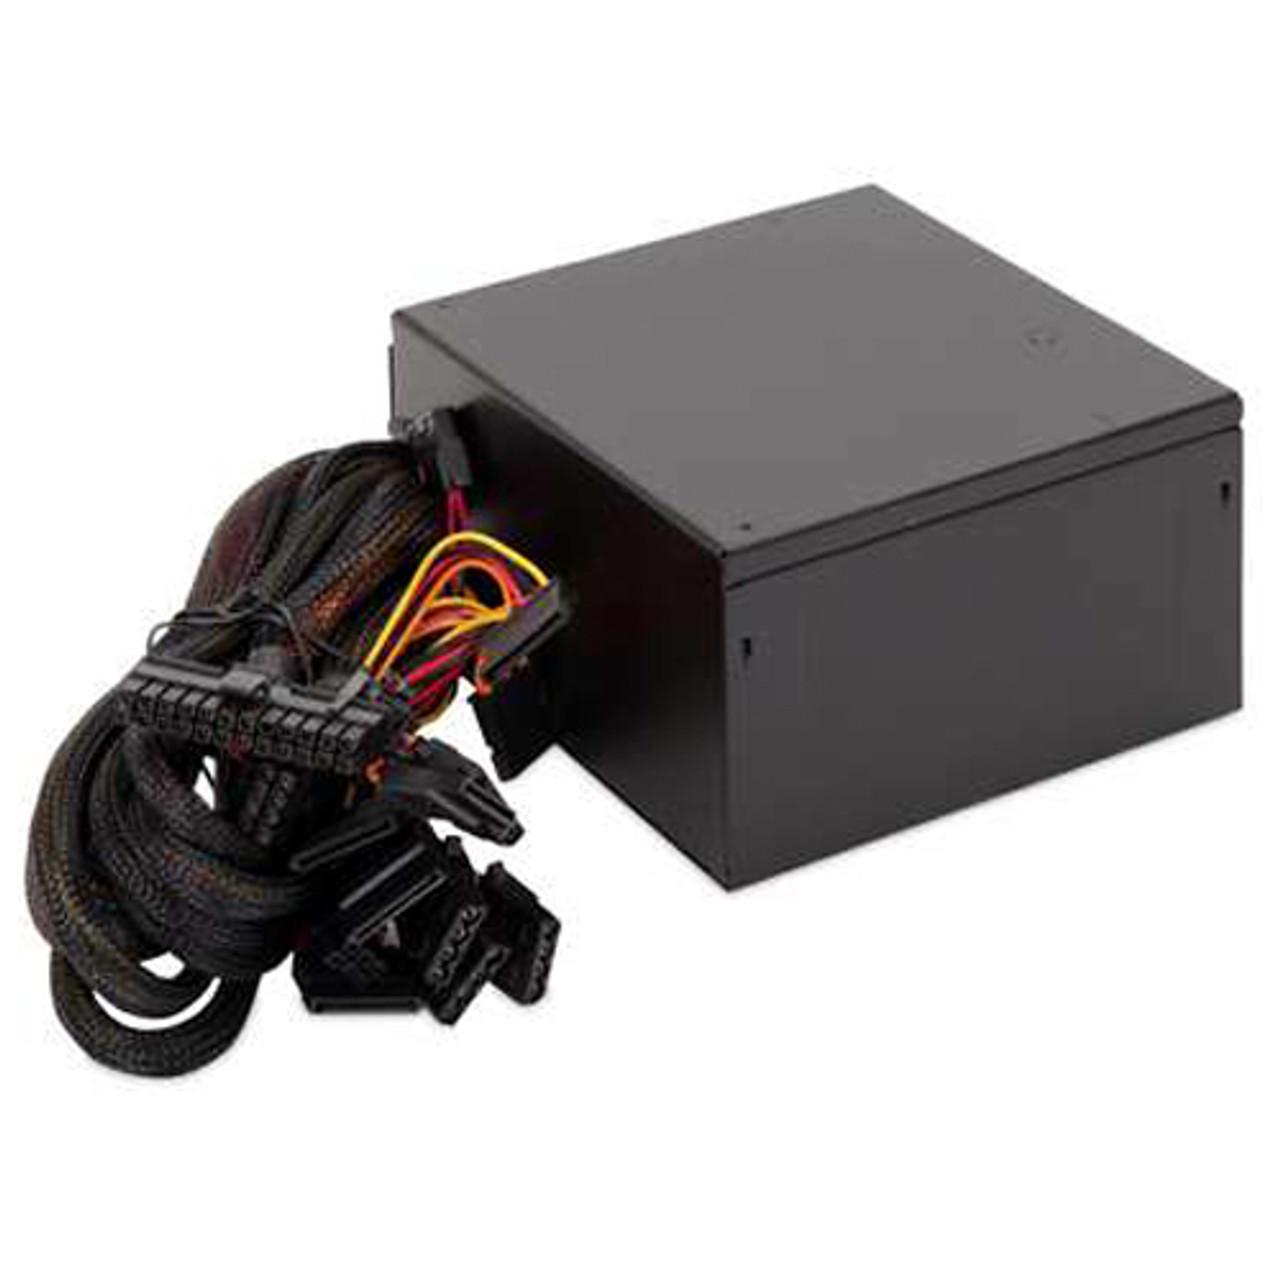 Solid Gear Neutron Series 550 Watt PS2 ATX Non-Modular Power Supply